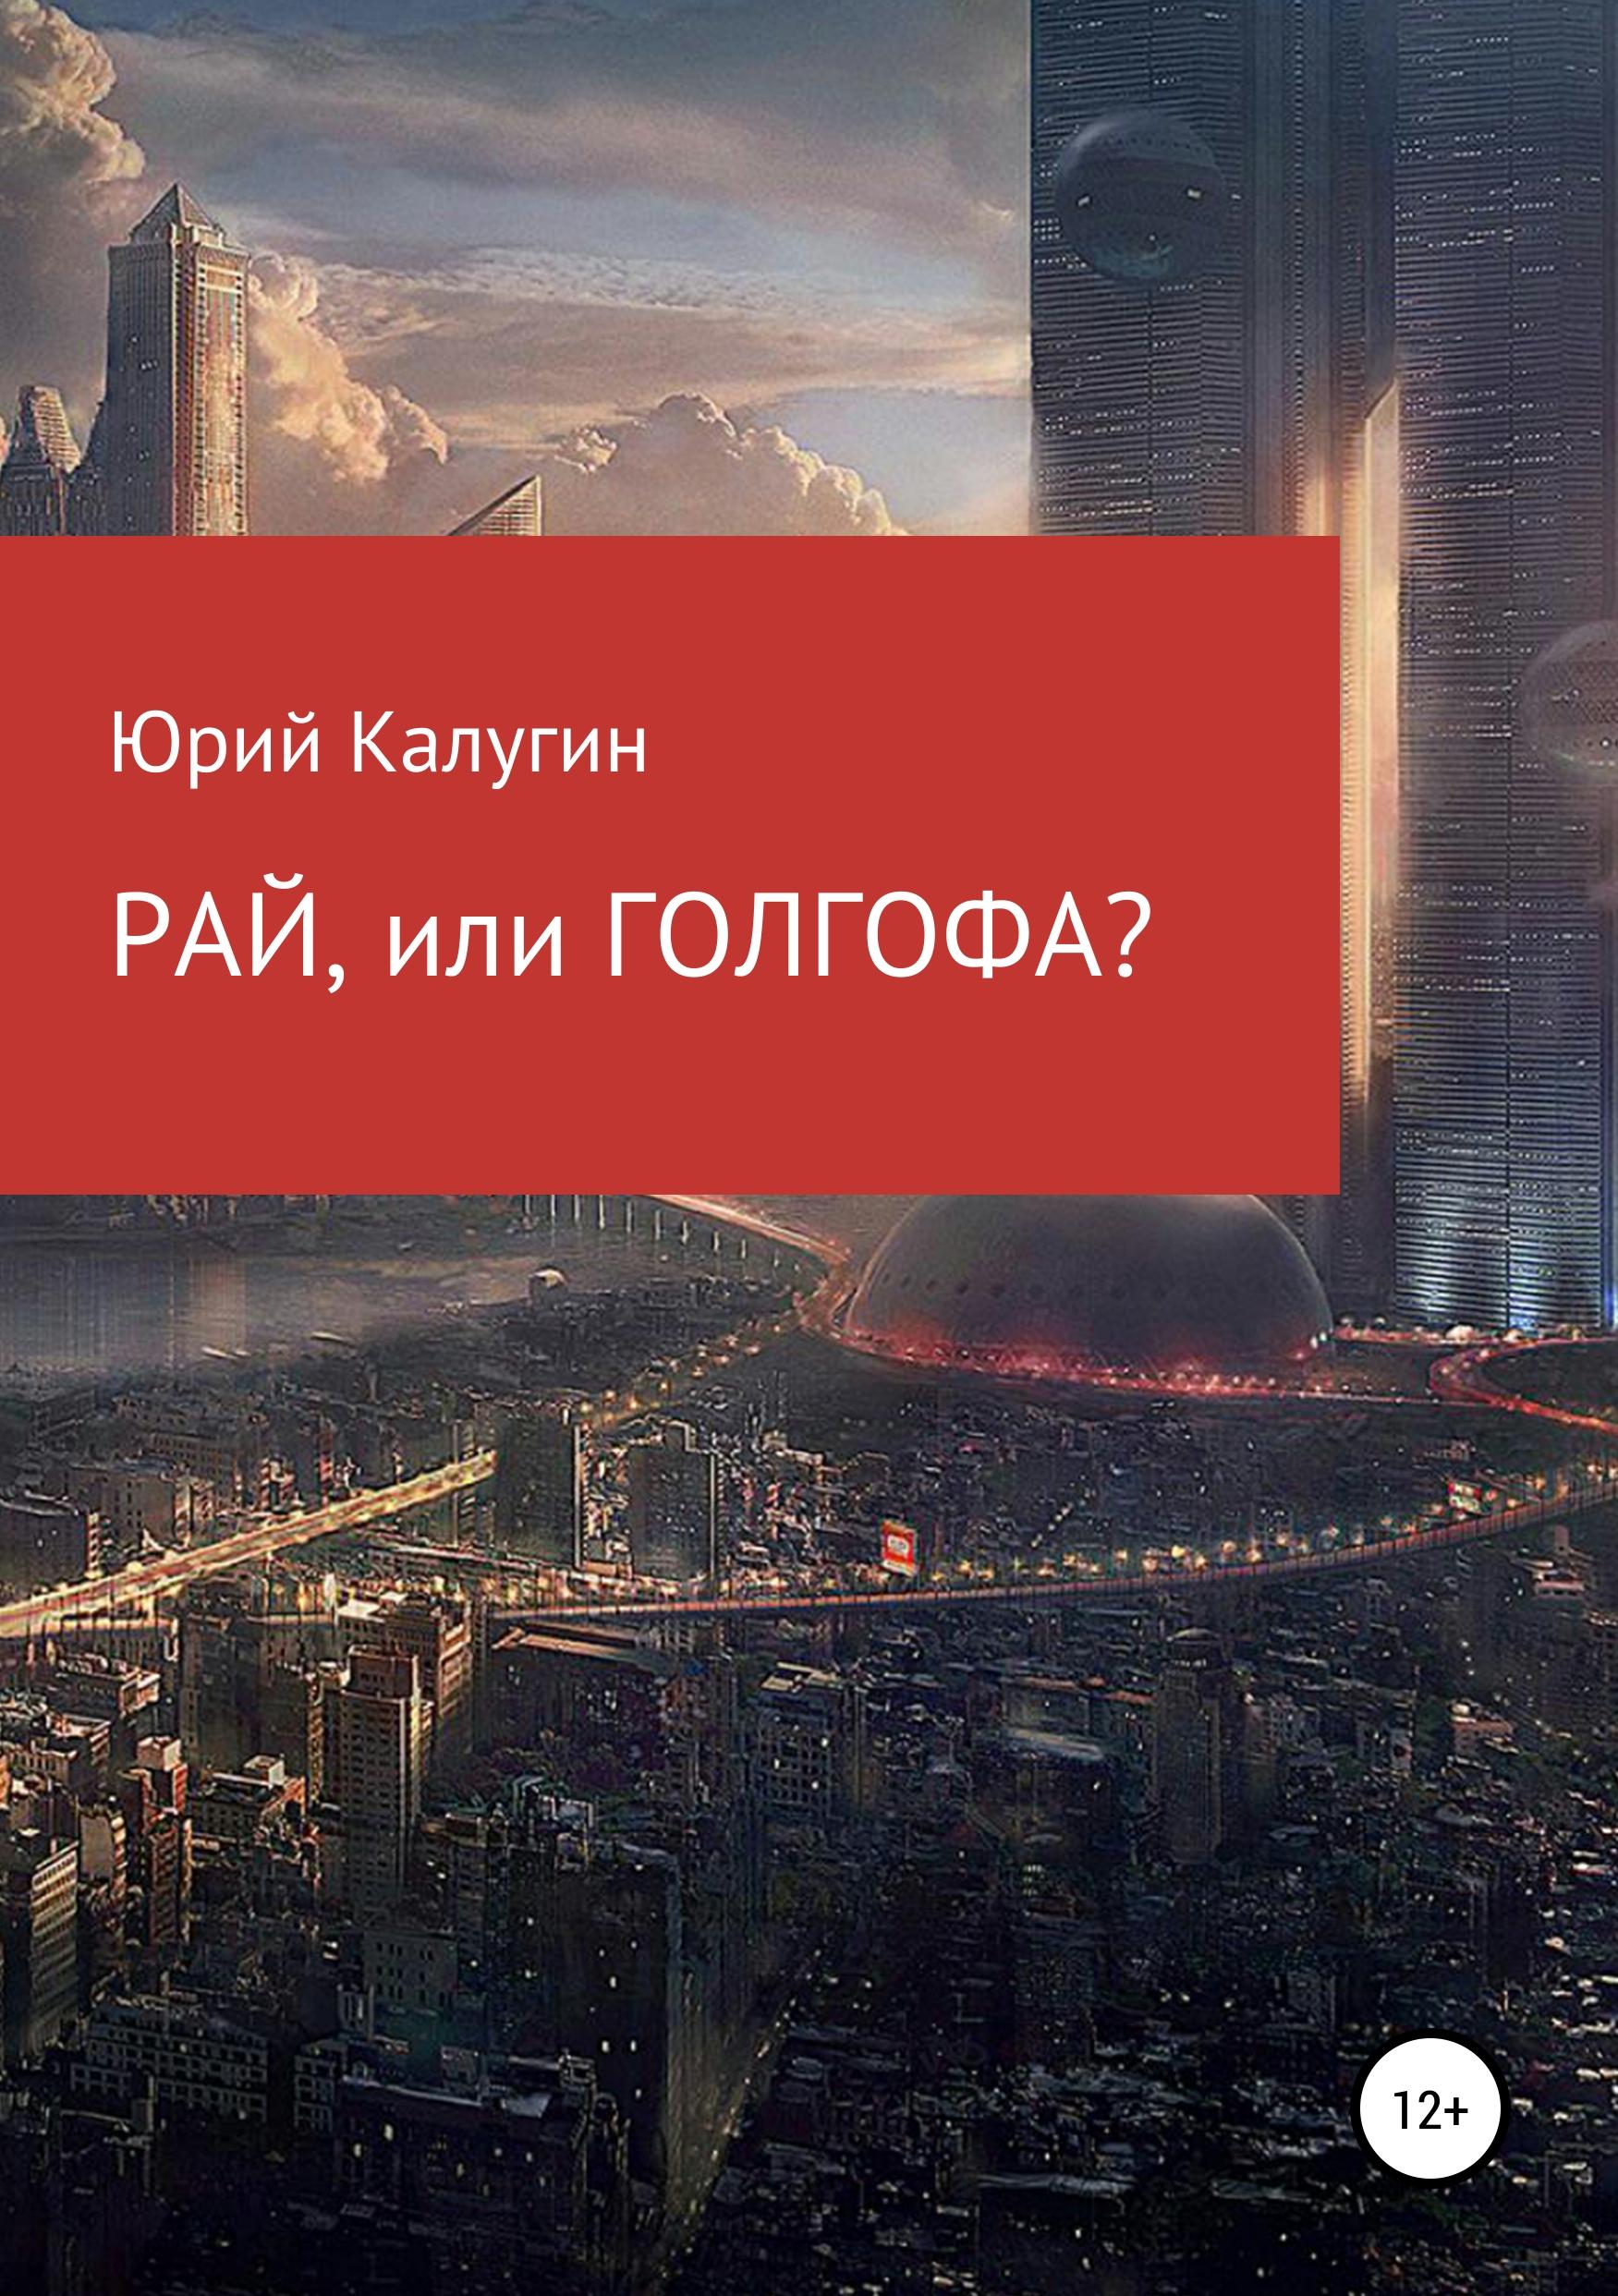 Купить книгу РАЙ, или ГОЛГОФА?, автора Юрия Викторовича Калугина